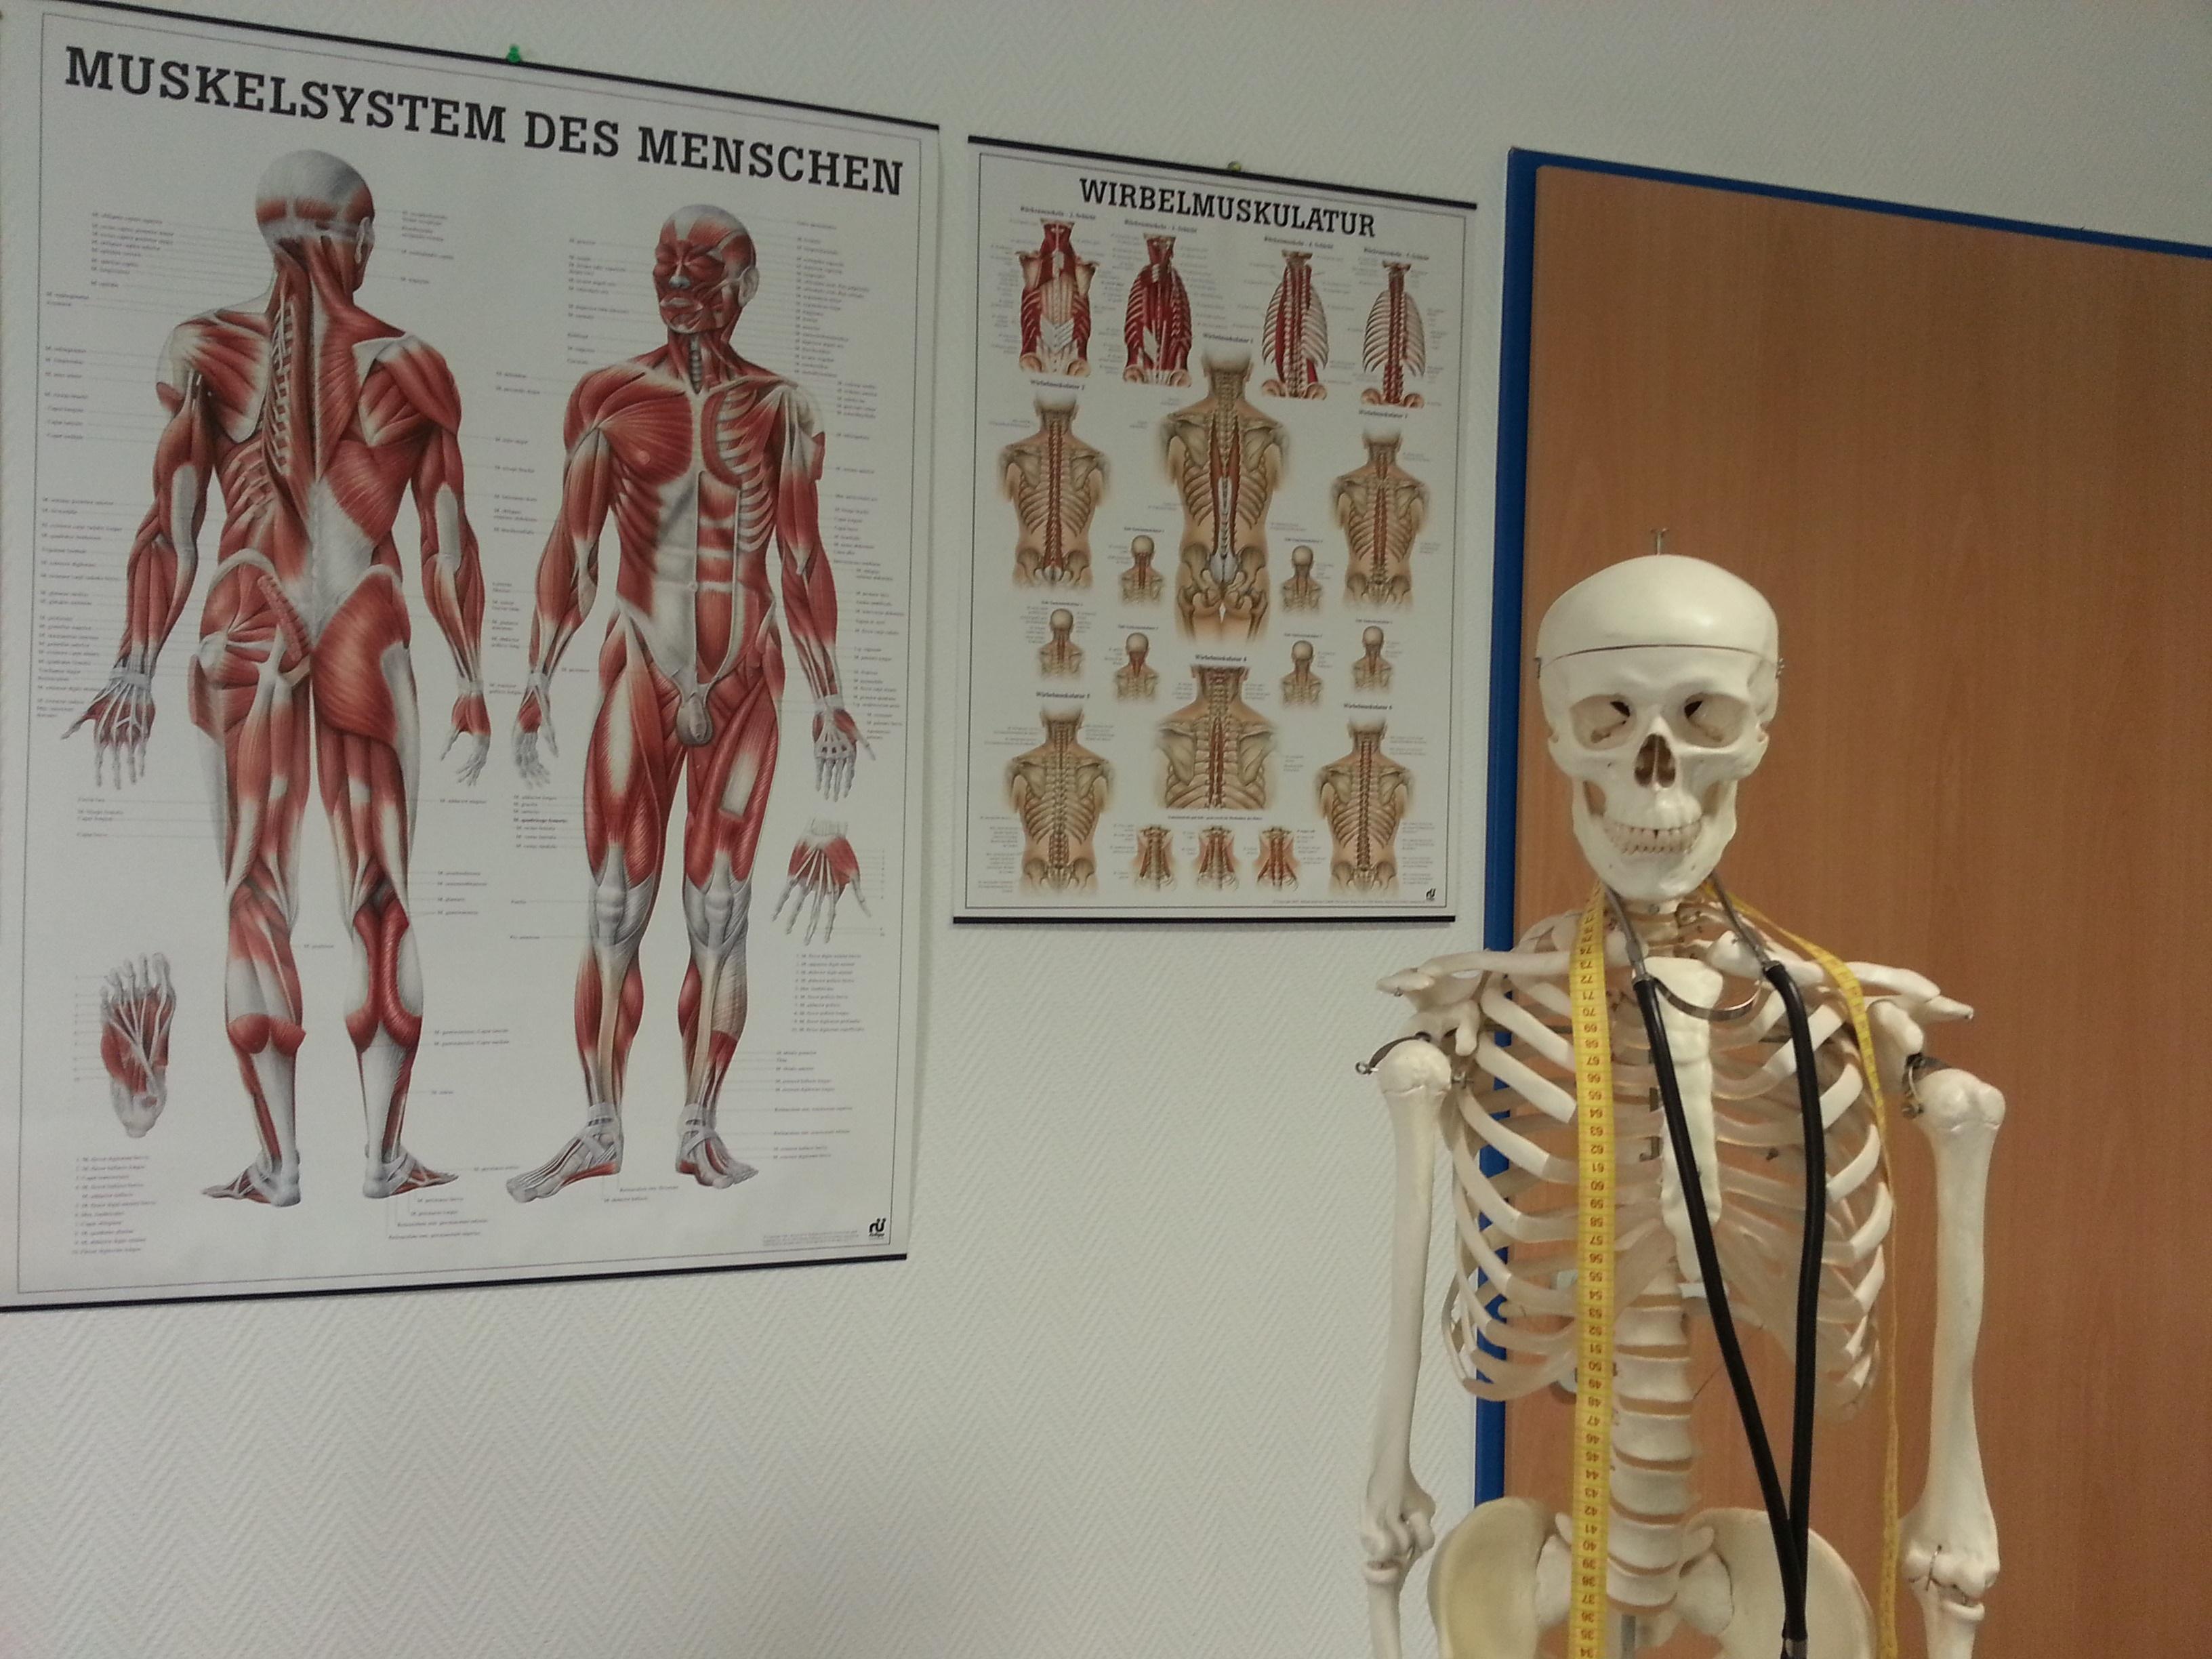 Fotograf Boyama Insan Vucudu Cizim Hastane Iskelet Anatomi